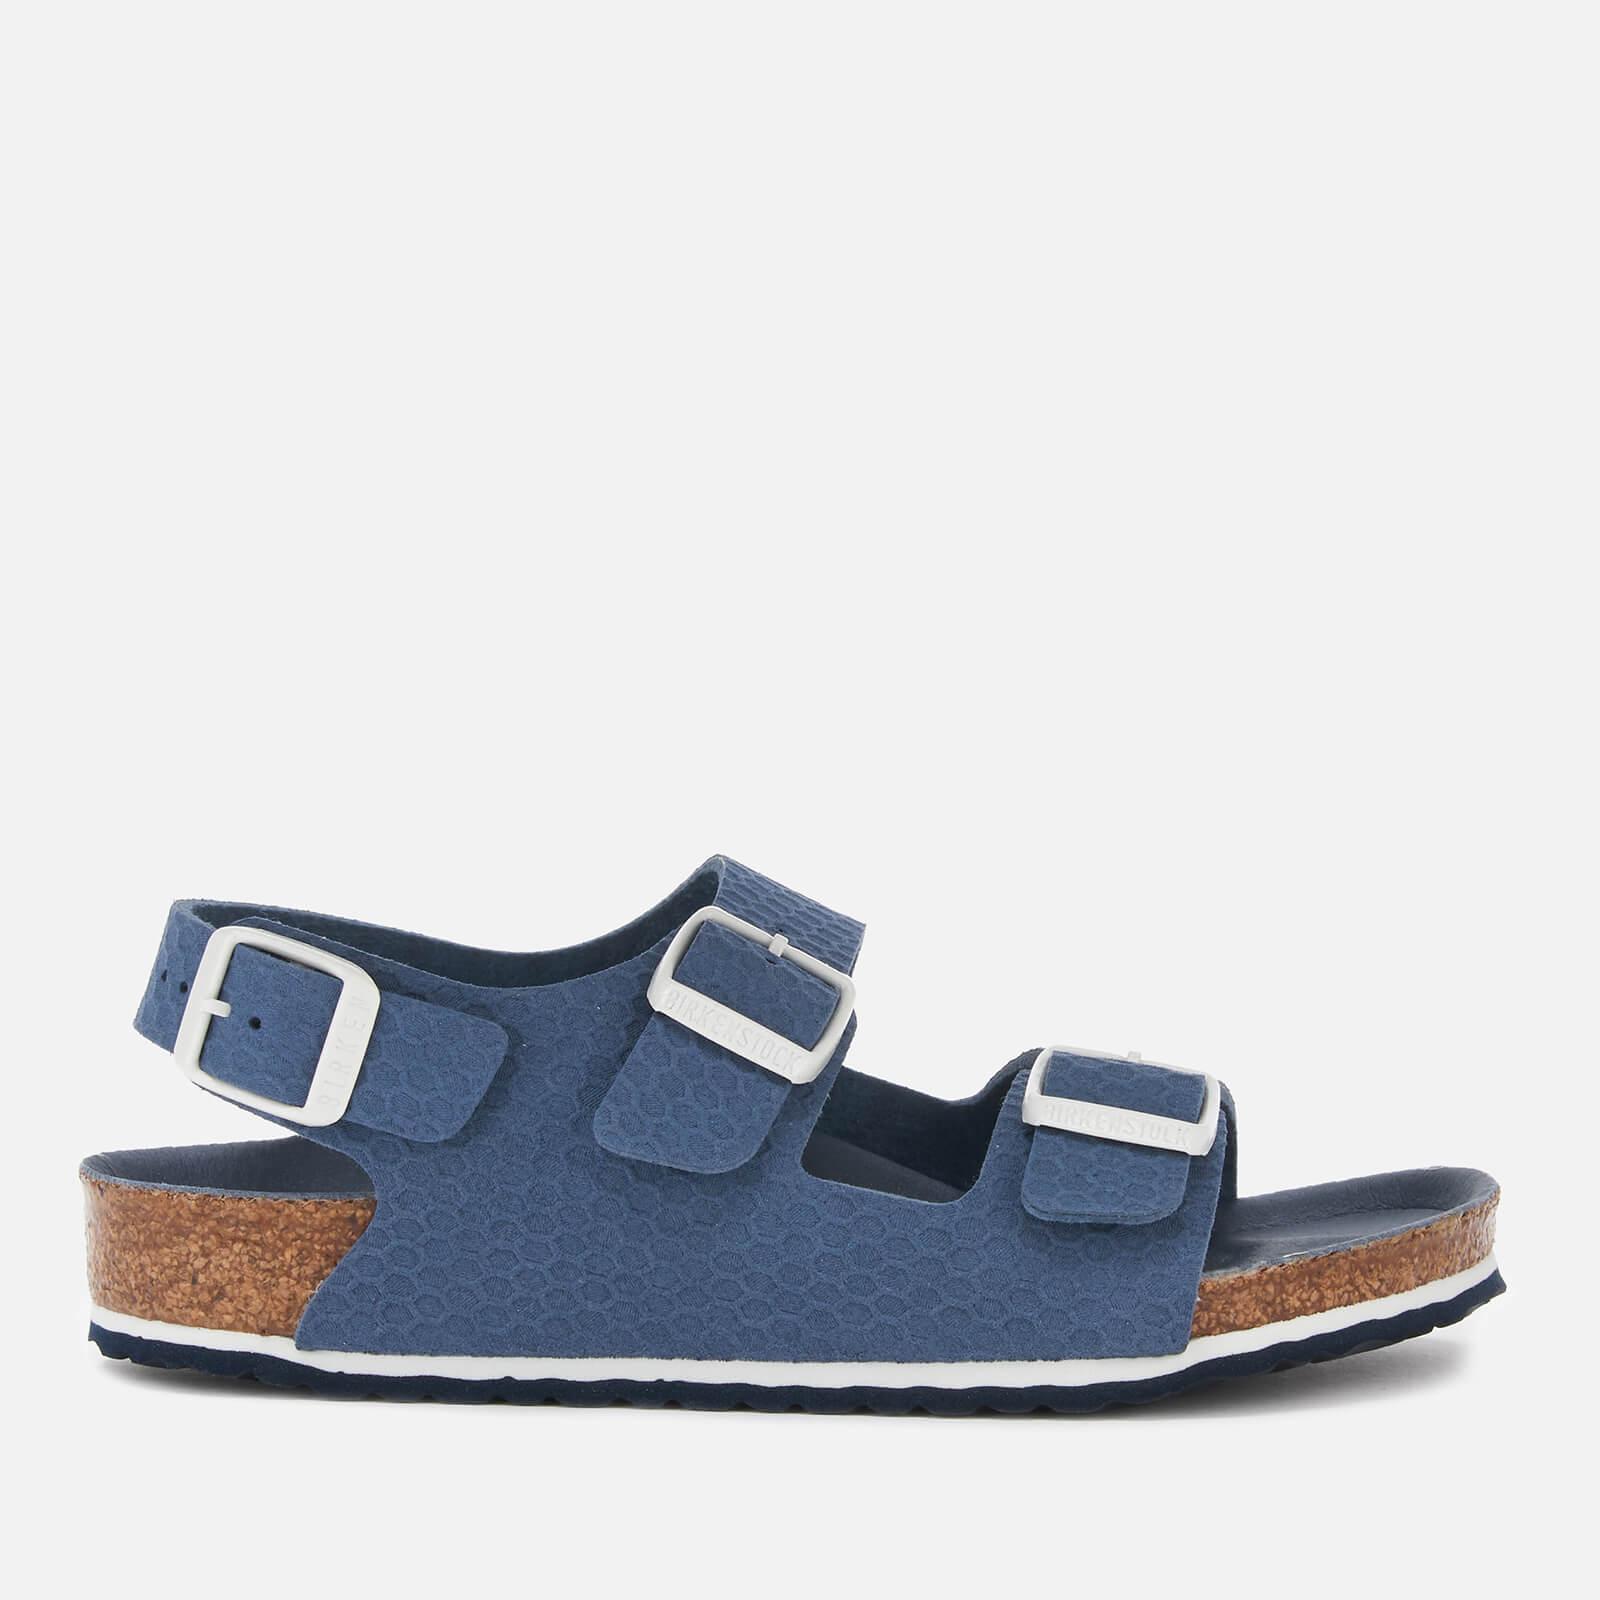 Birkenstock Kids' Milano Double Strap Sandals - Hexagon Tech Blue - EU 32/UK 13.5